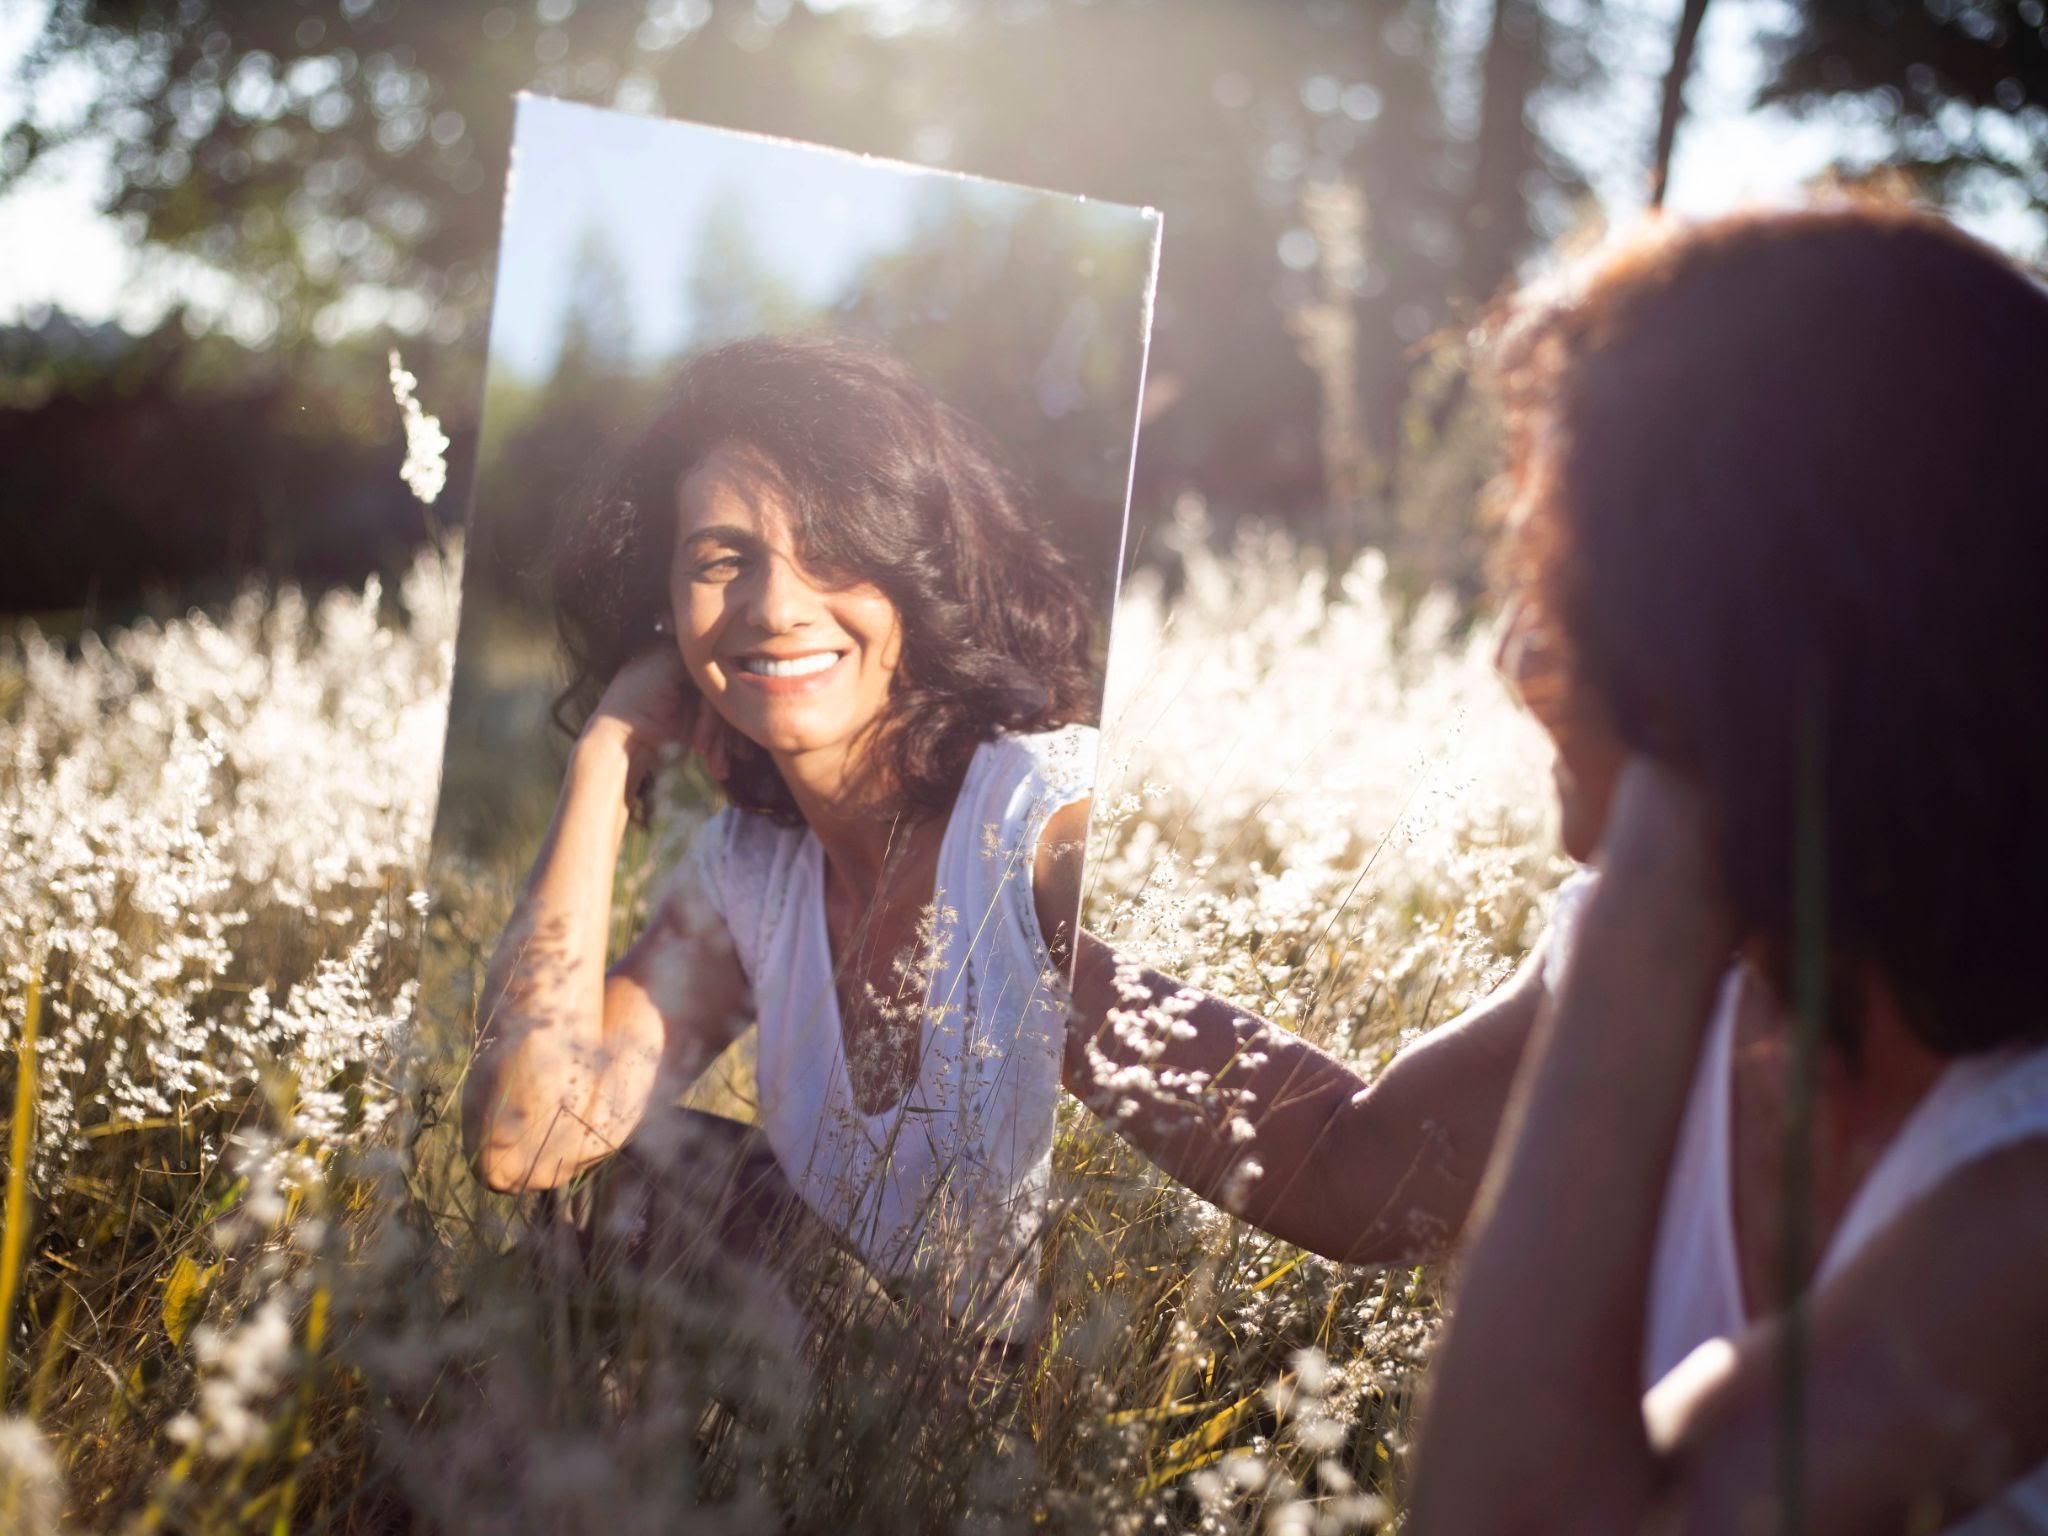 how does social media affect mental health - Narcissism